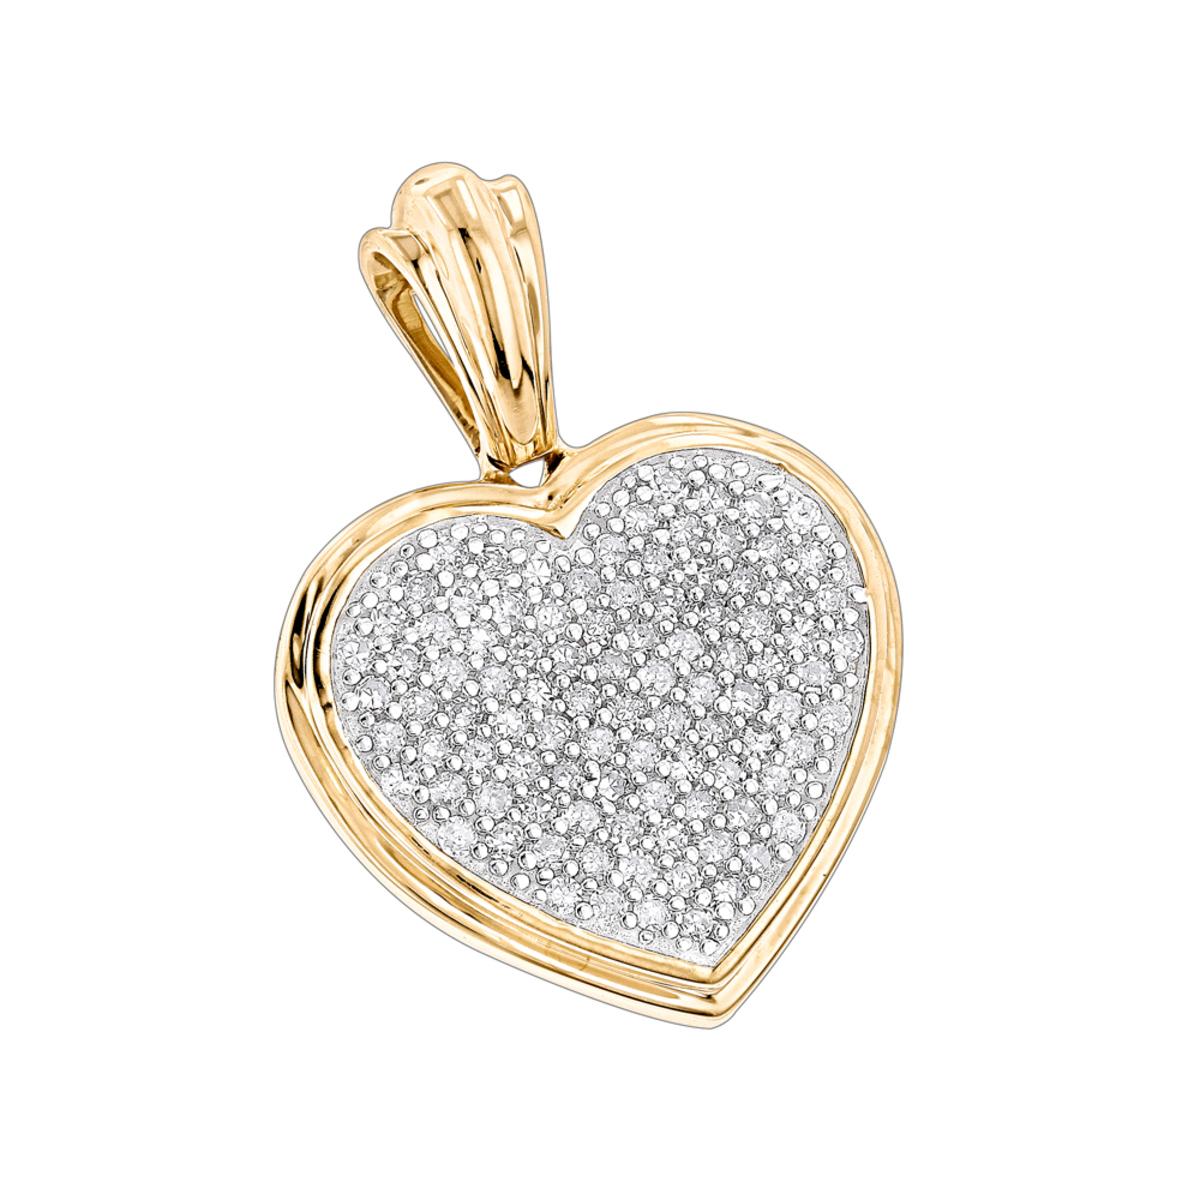 14K Gold Diamond Heart Pendant 0.33ct